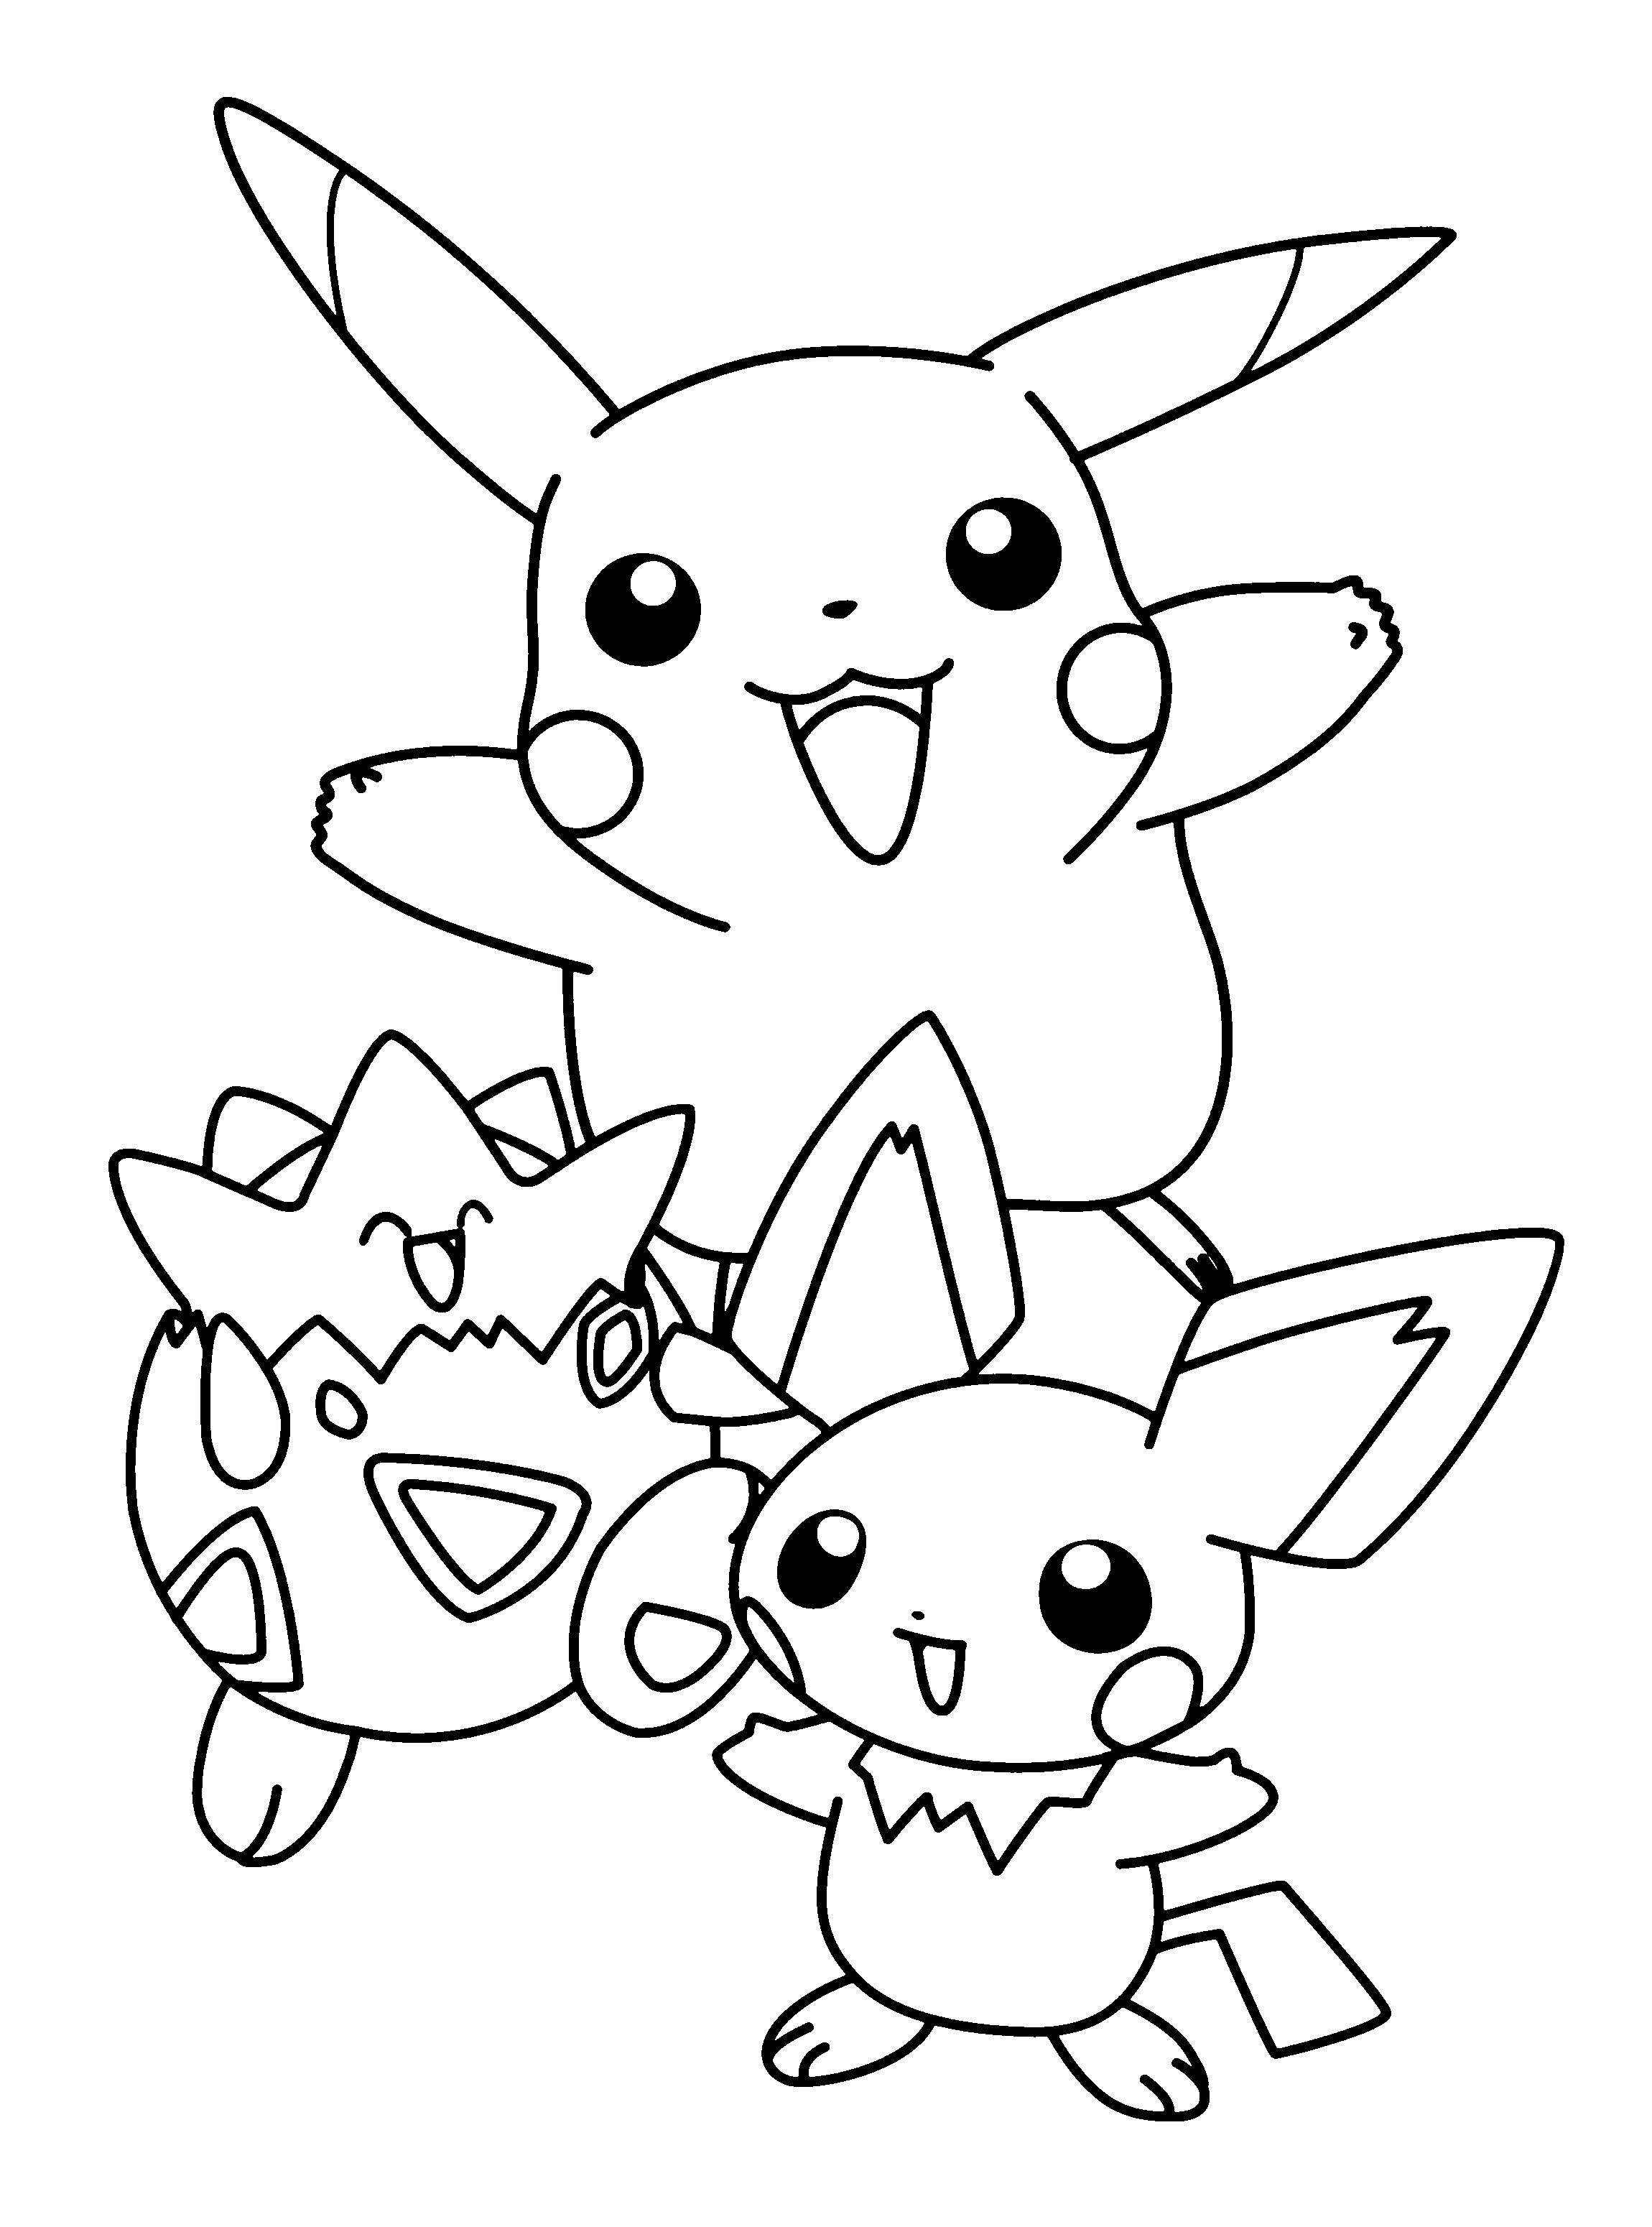 Pokemon coloring pages free download procoloringpokemon